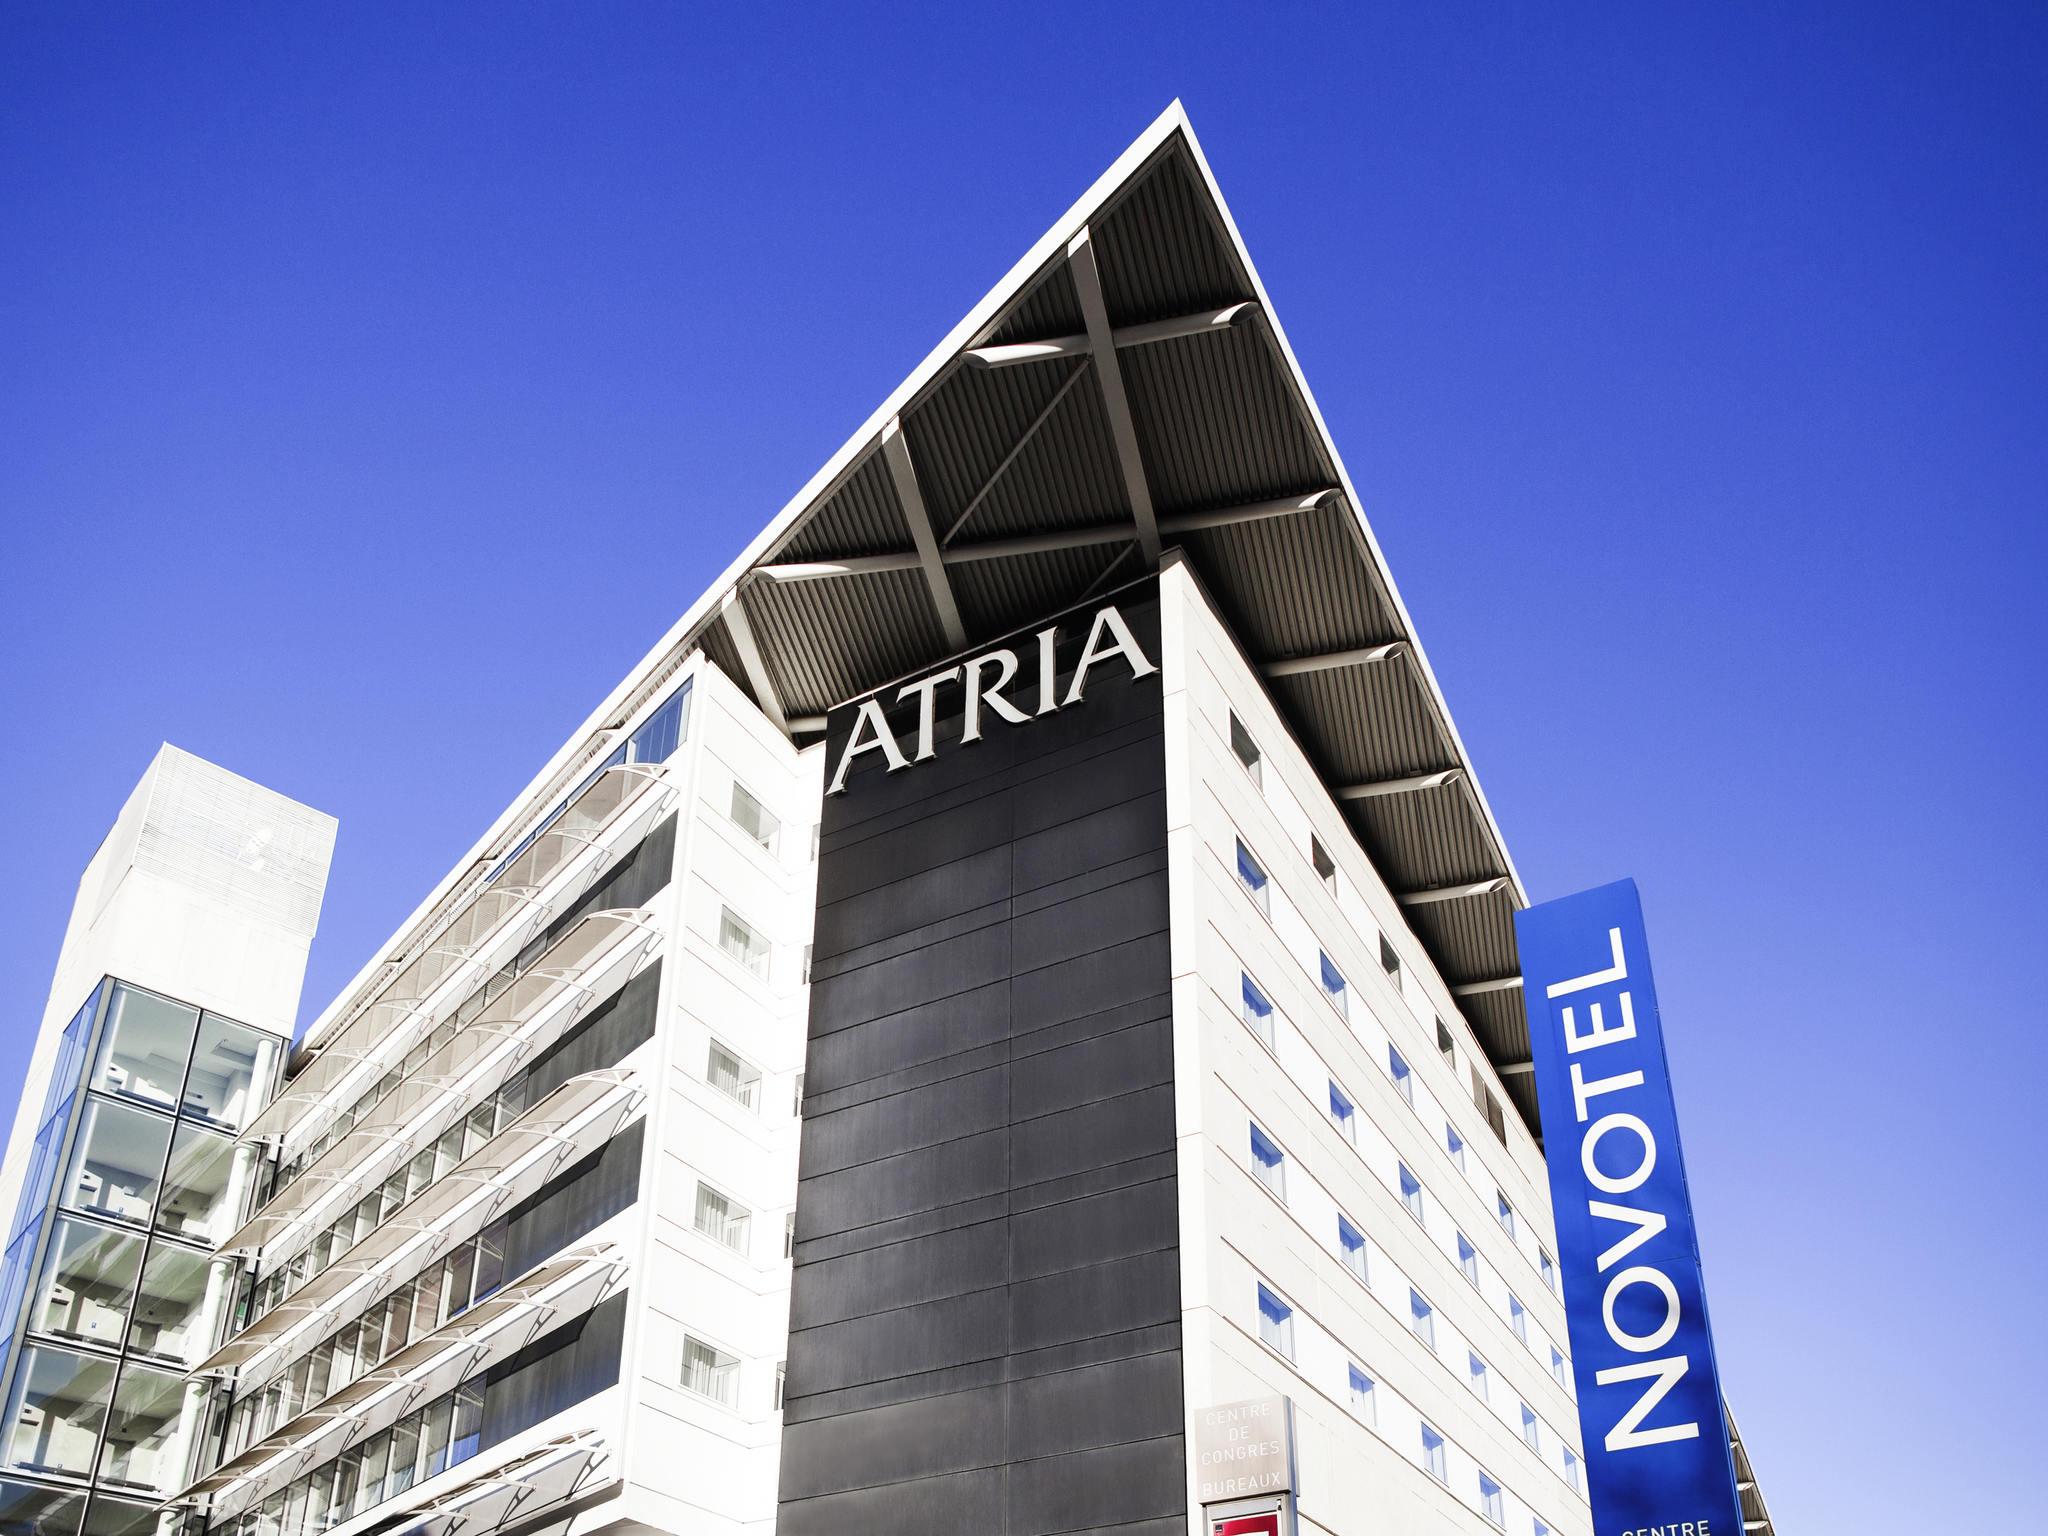 فندق - Novotel Belfort Centre Atria